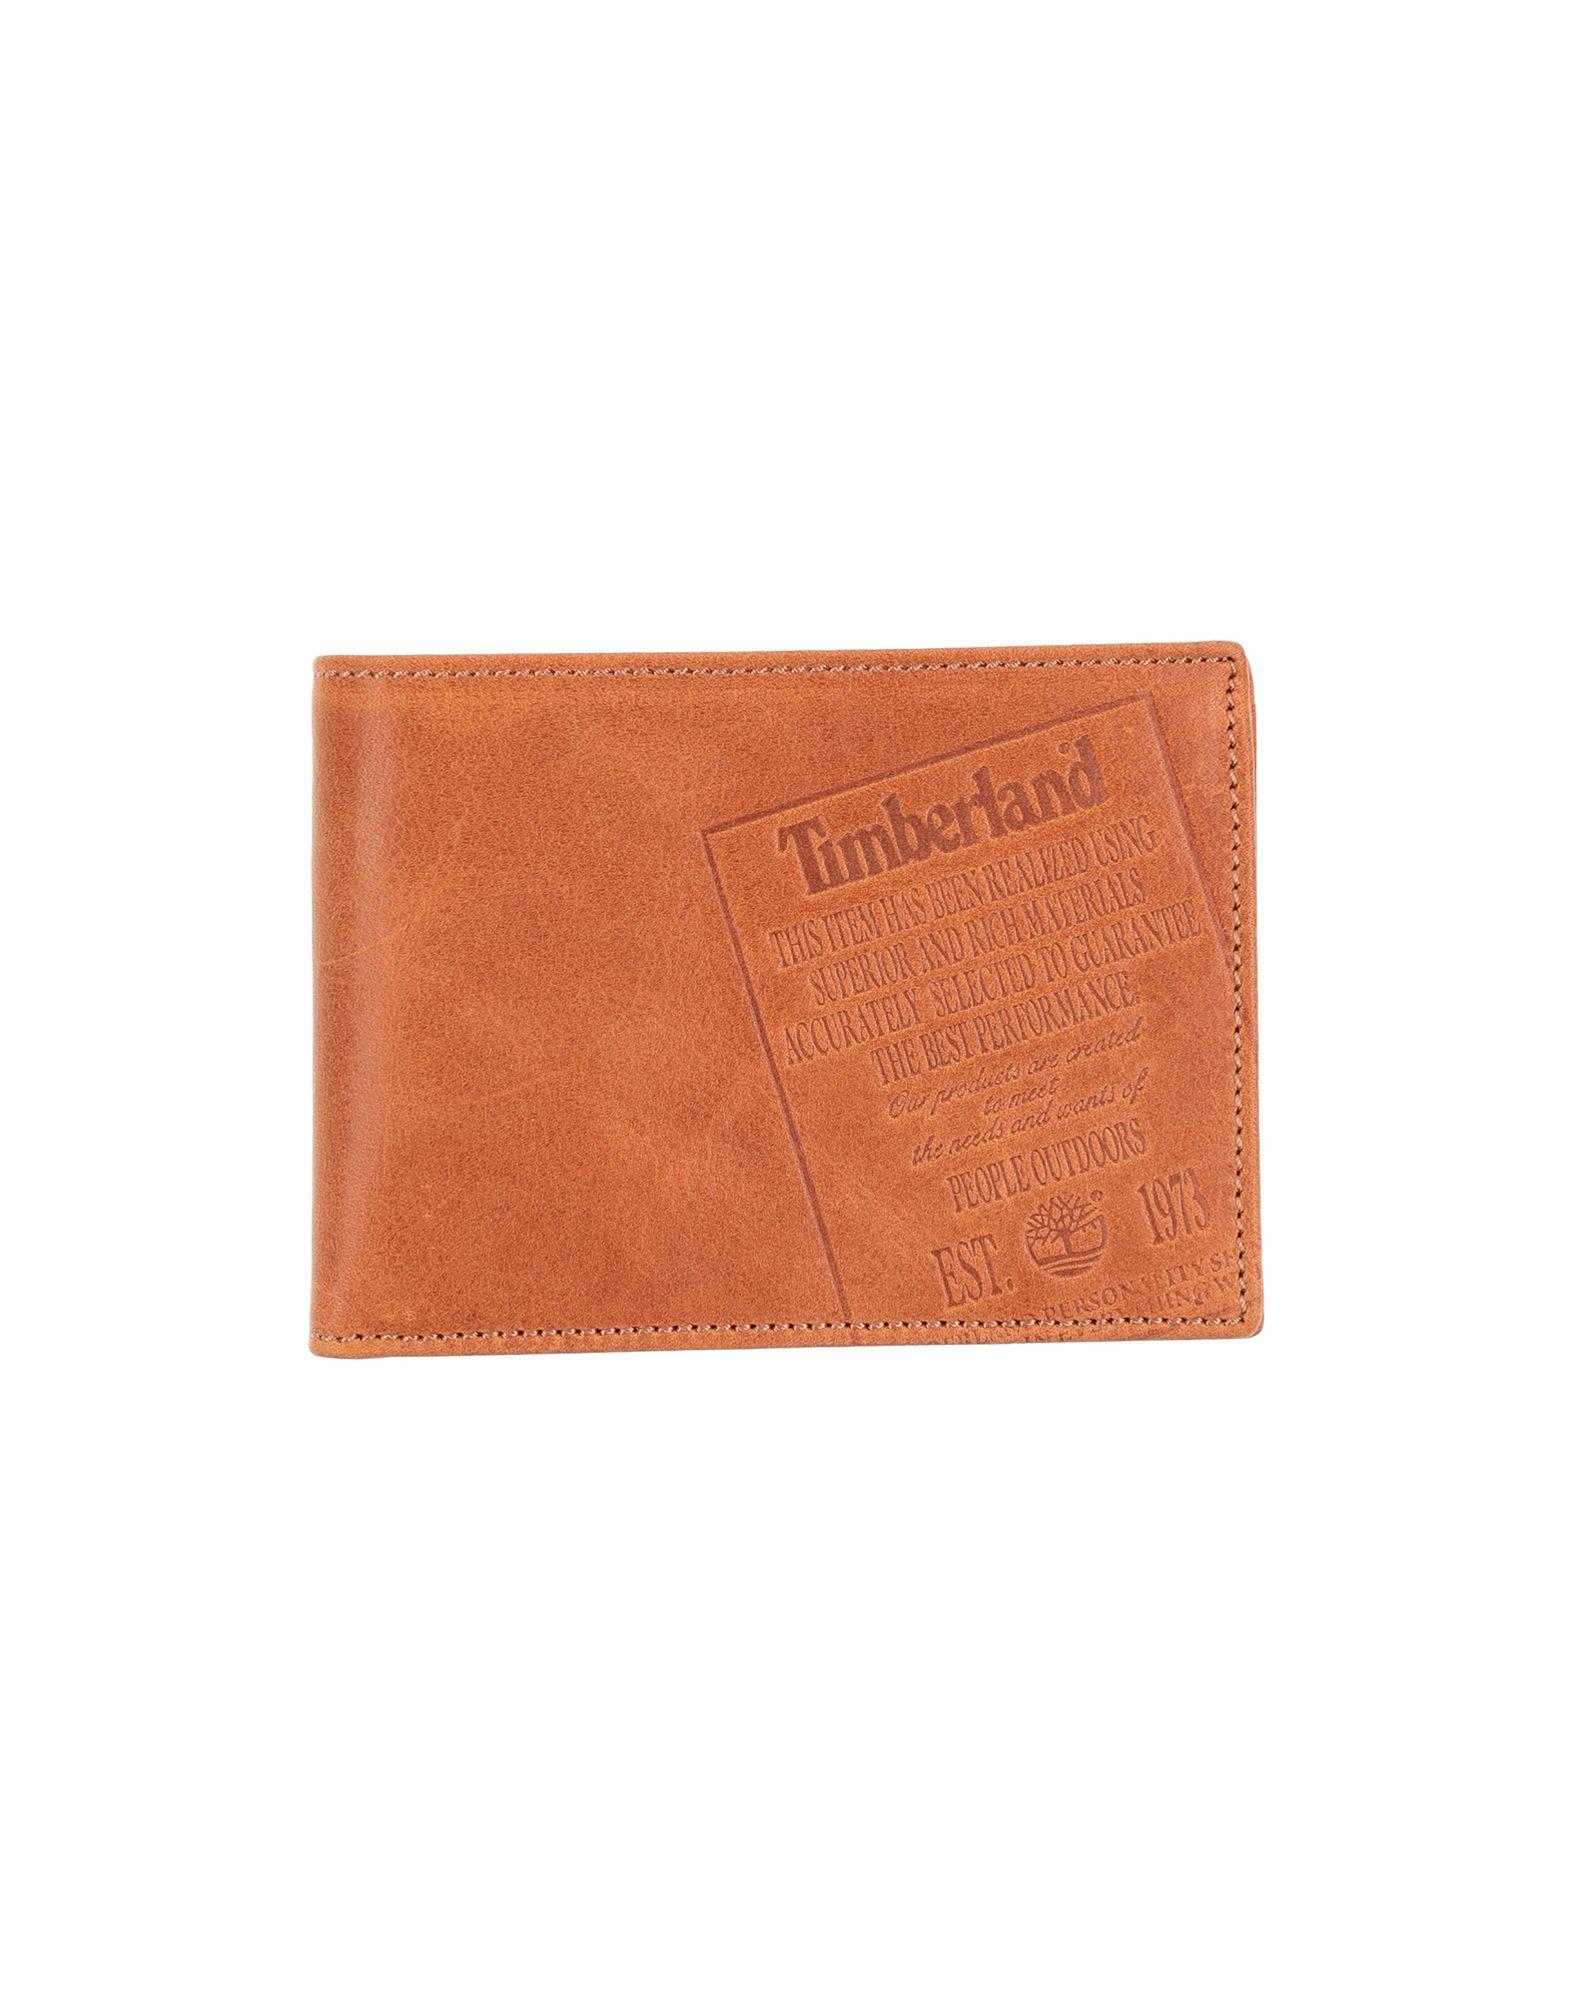 1af5ccdd20 Timberland Wallet - Men Timberland Wallets online on YOOX United States -  46626686NU